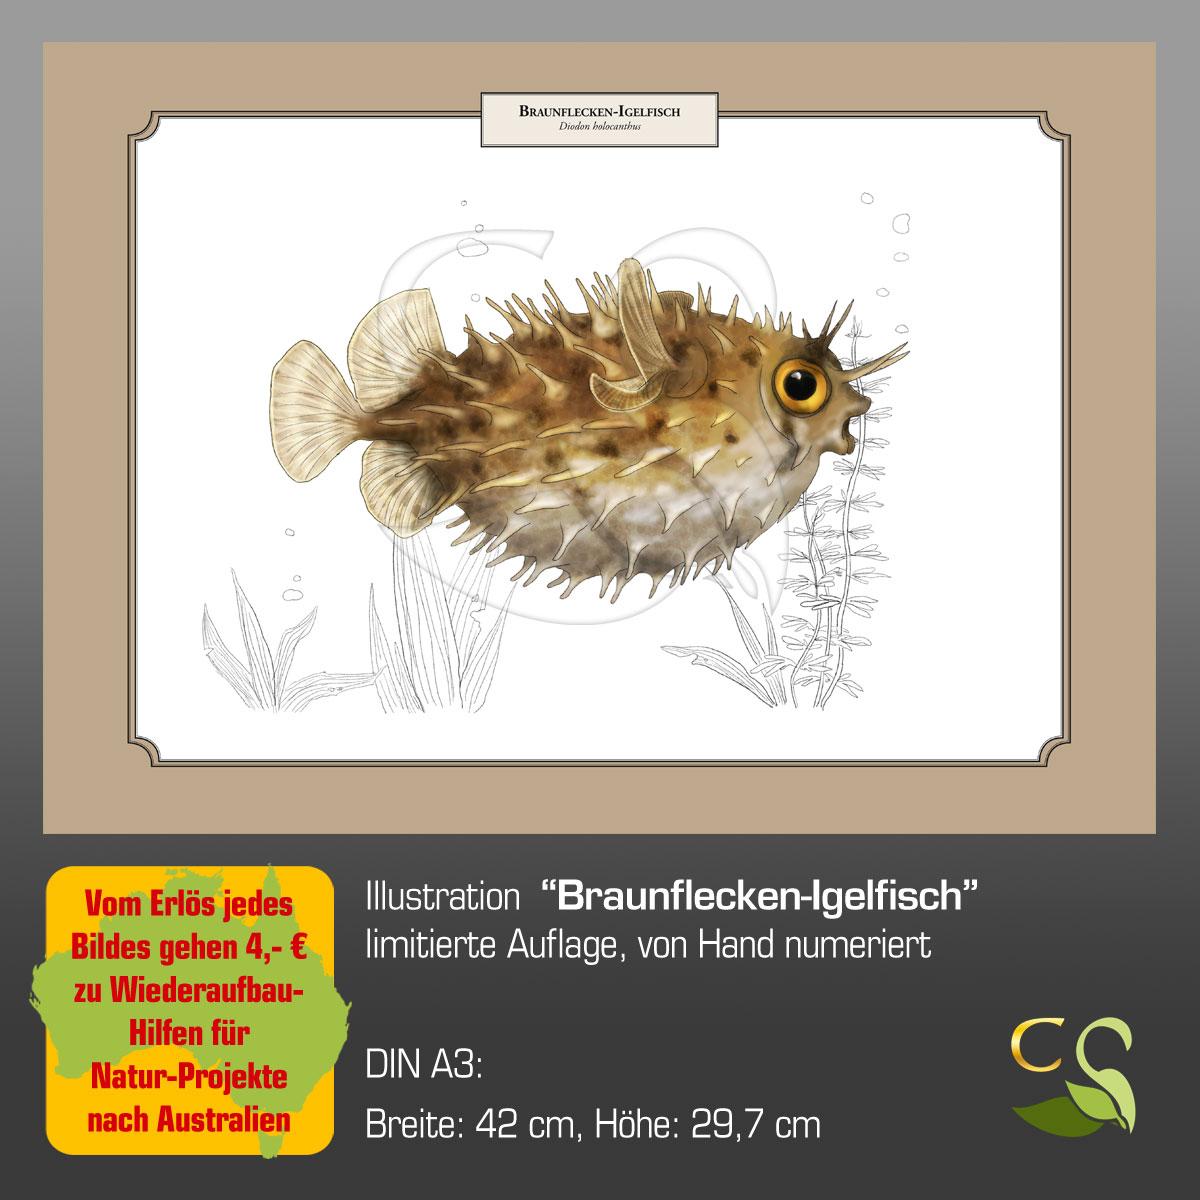 BraunfIgelfischA3fA